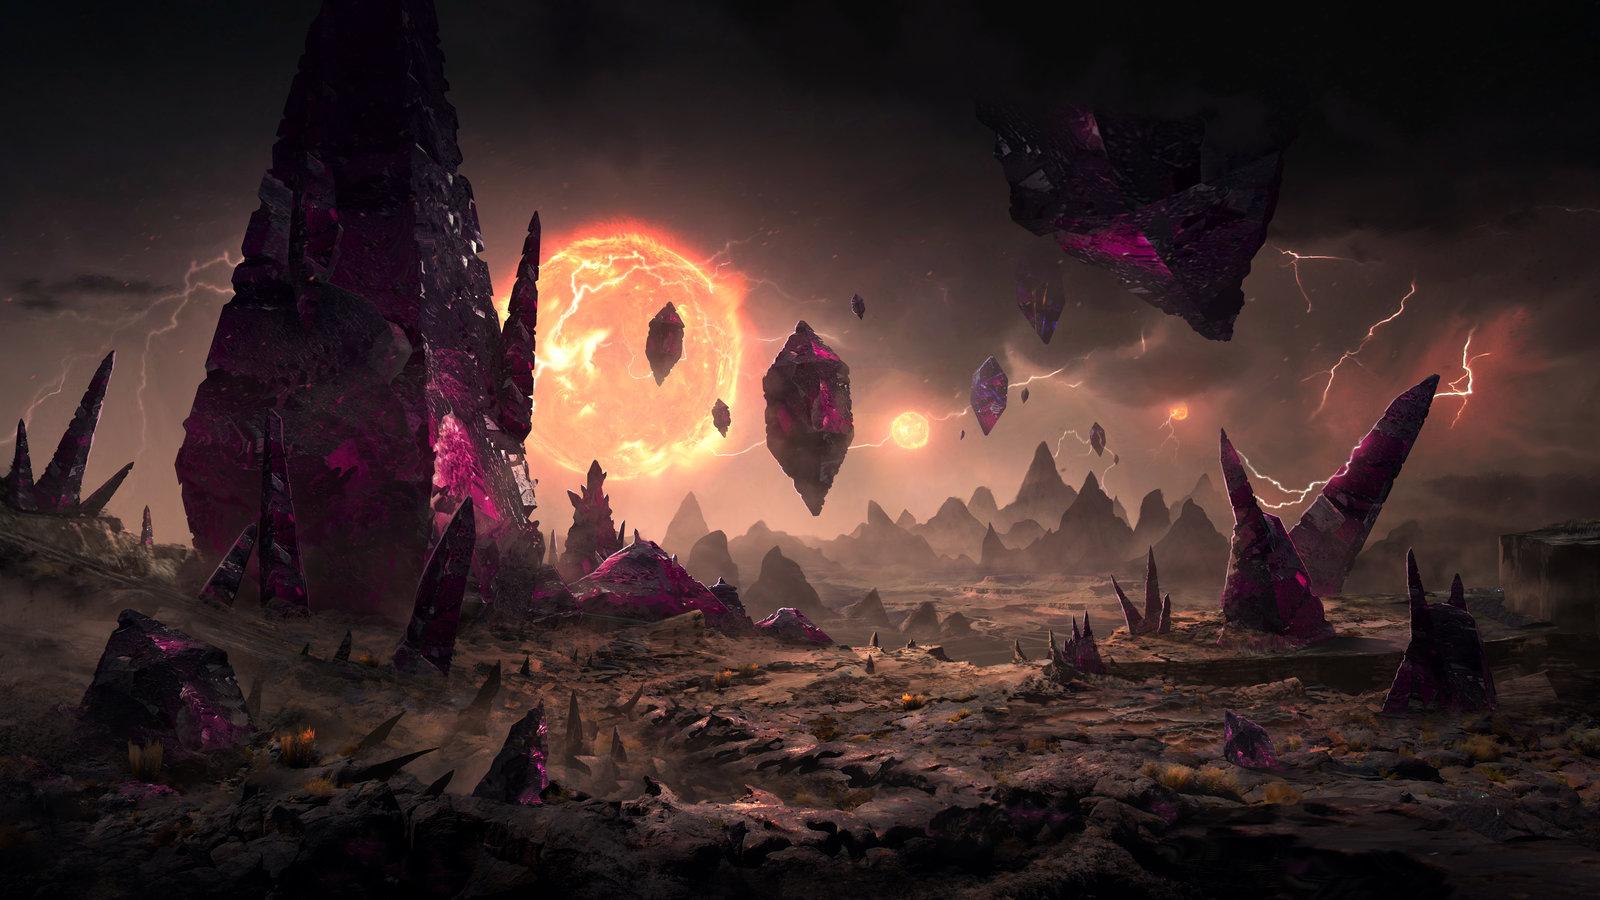 1229-alien-wasteland-dominique-velsen